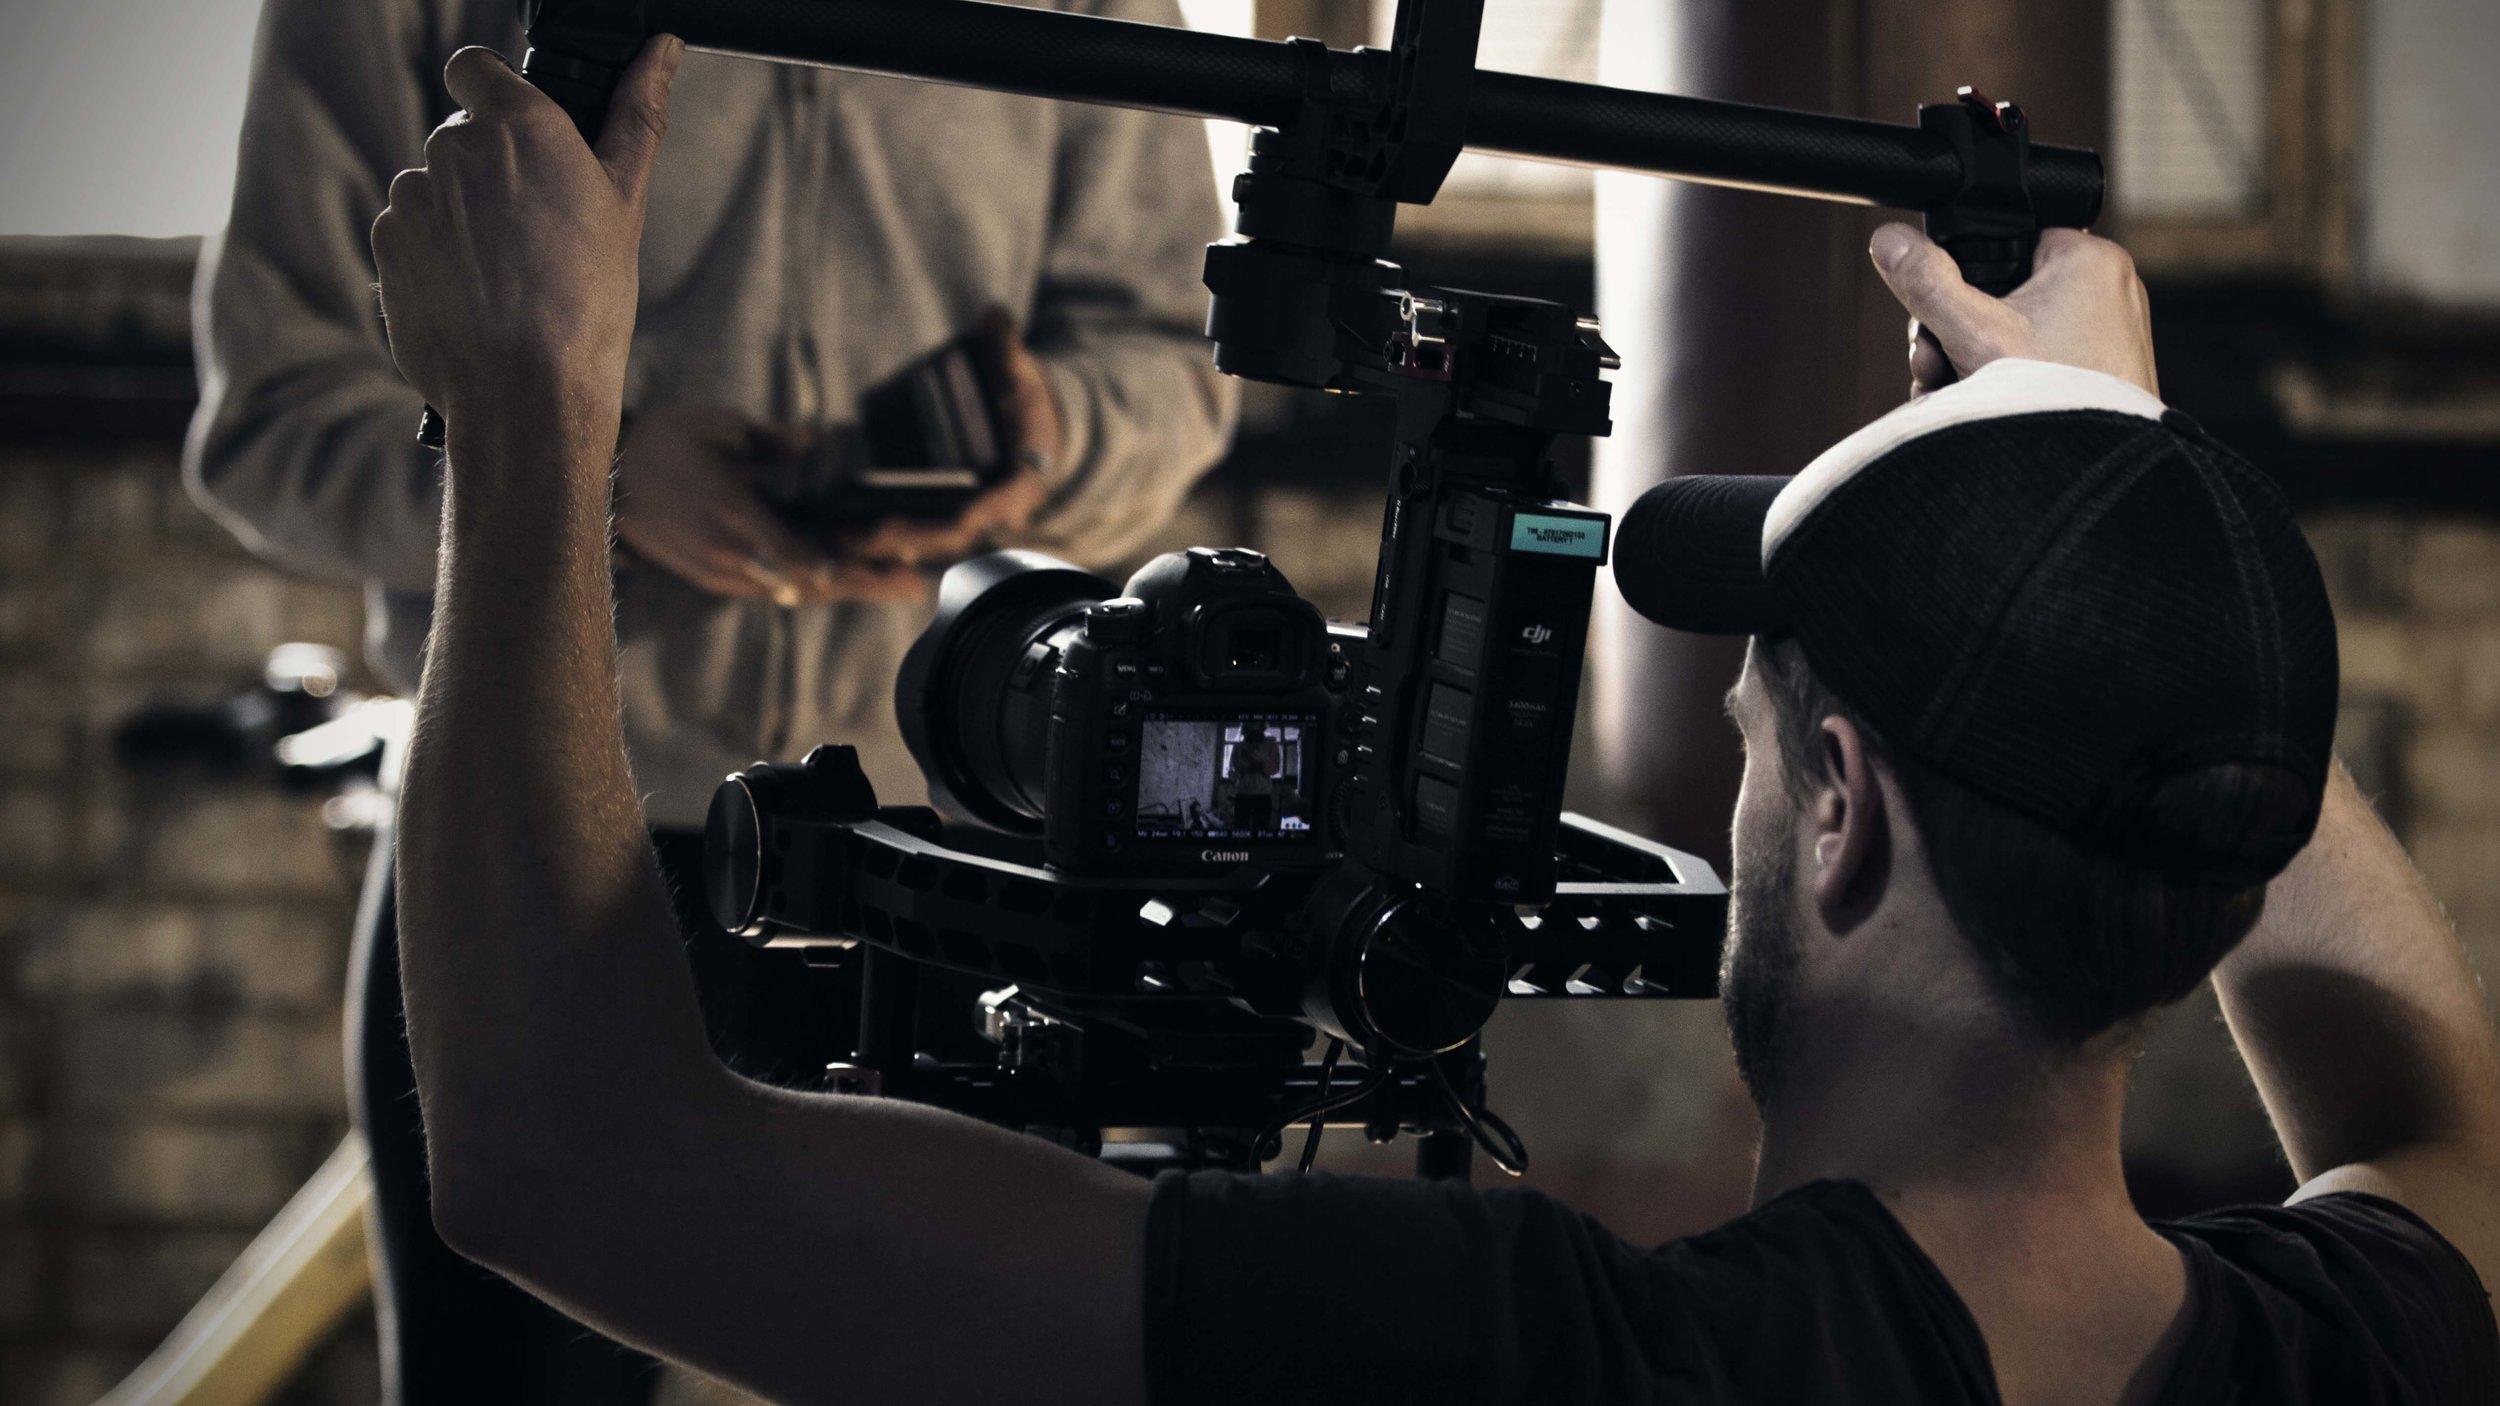 Video Production - Full video production including camera operators, editors and directors